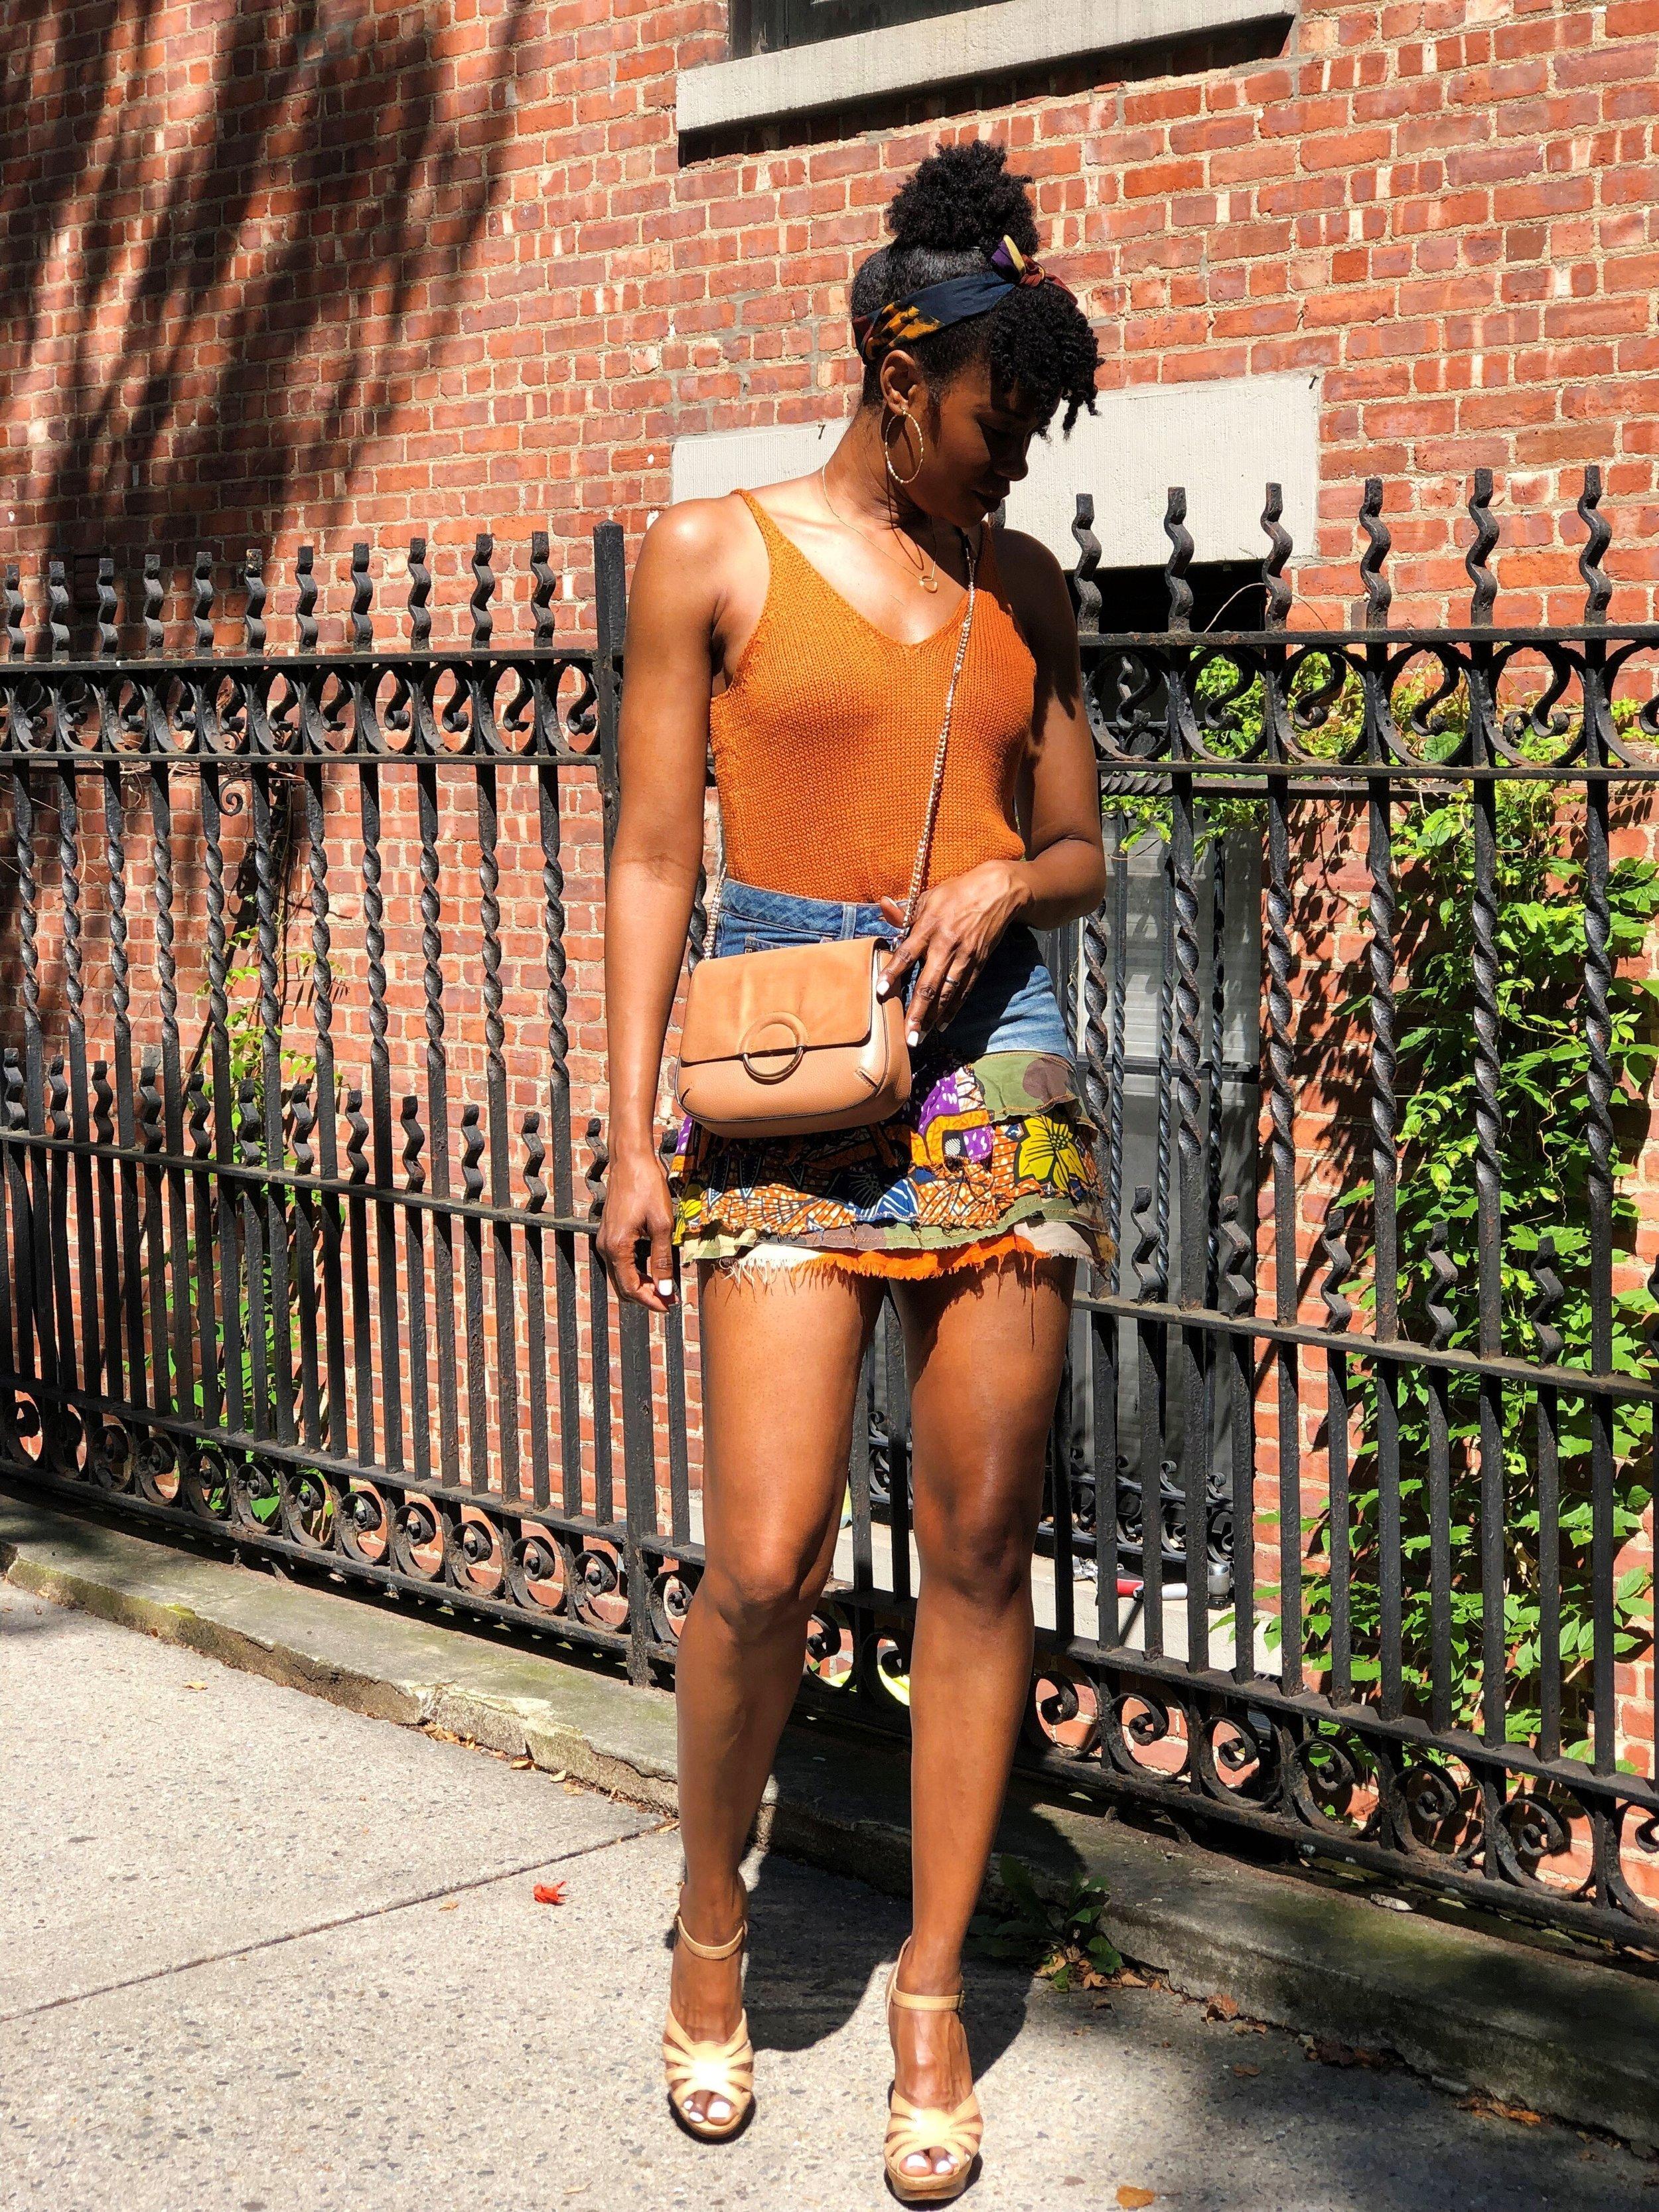 Skirt: VIntage MissSixty